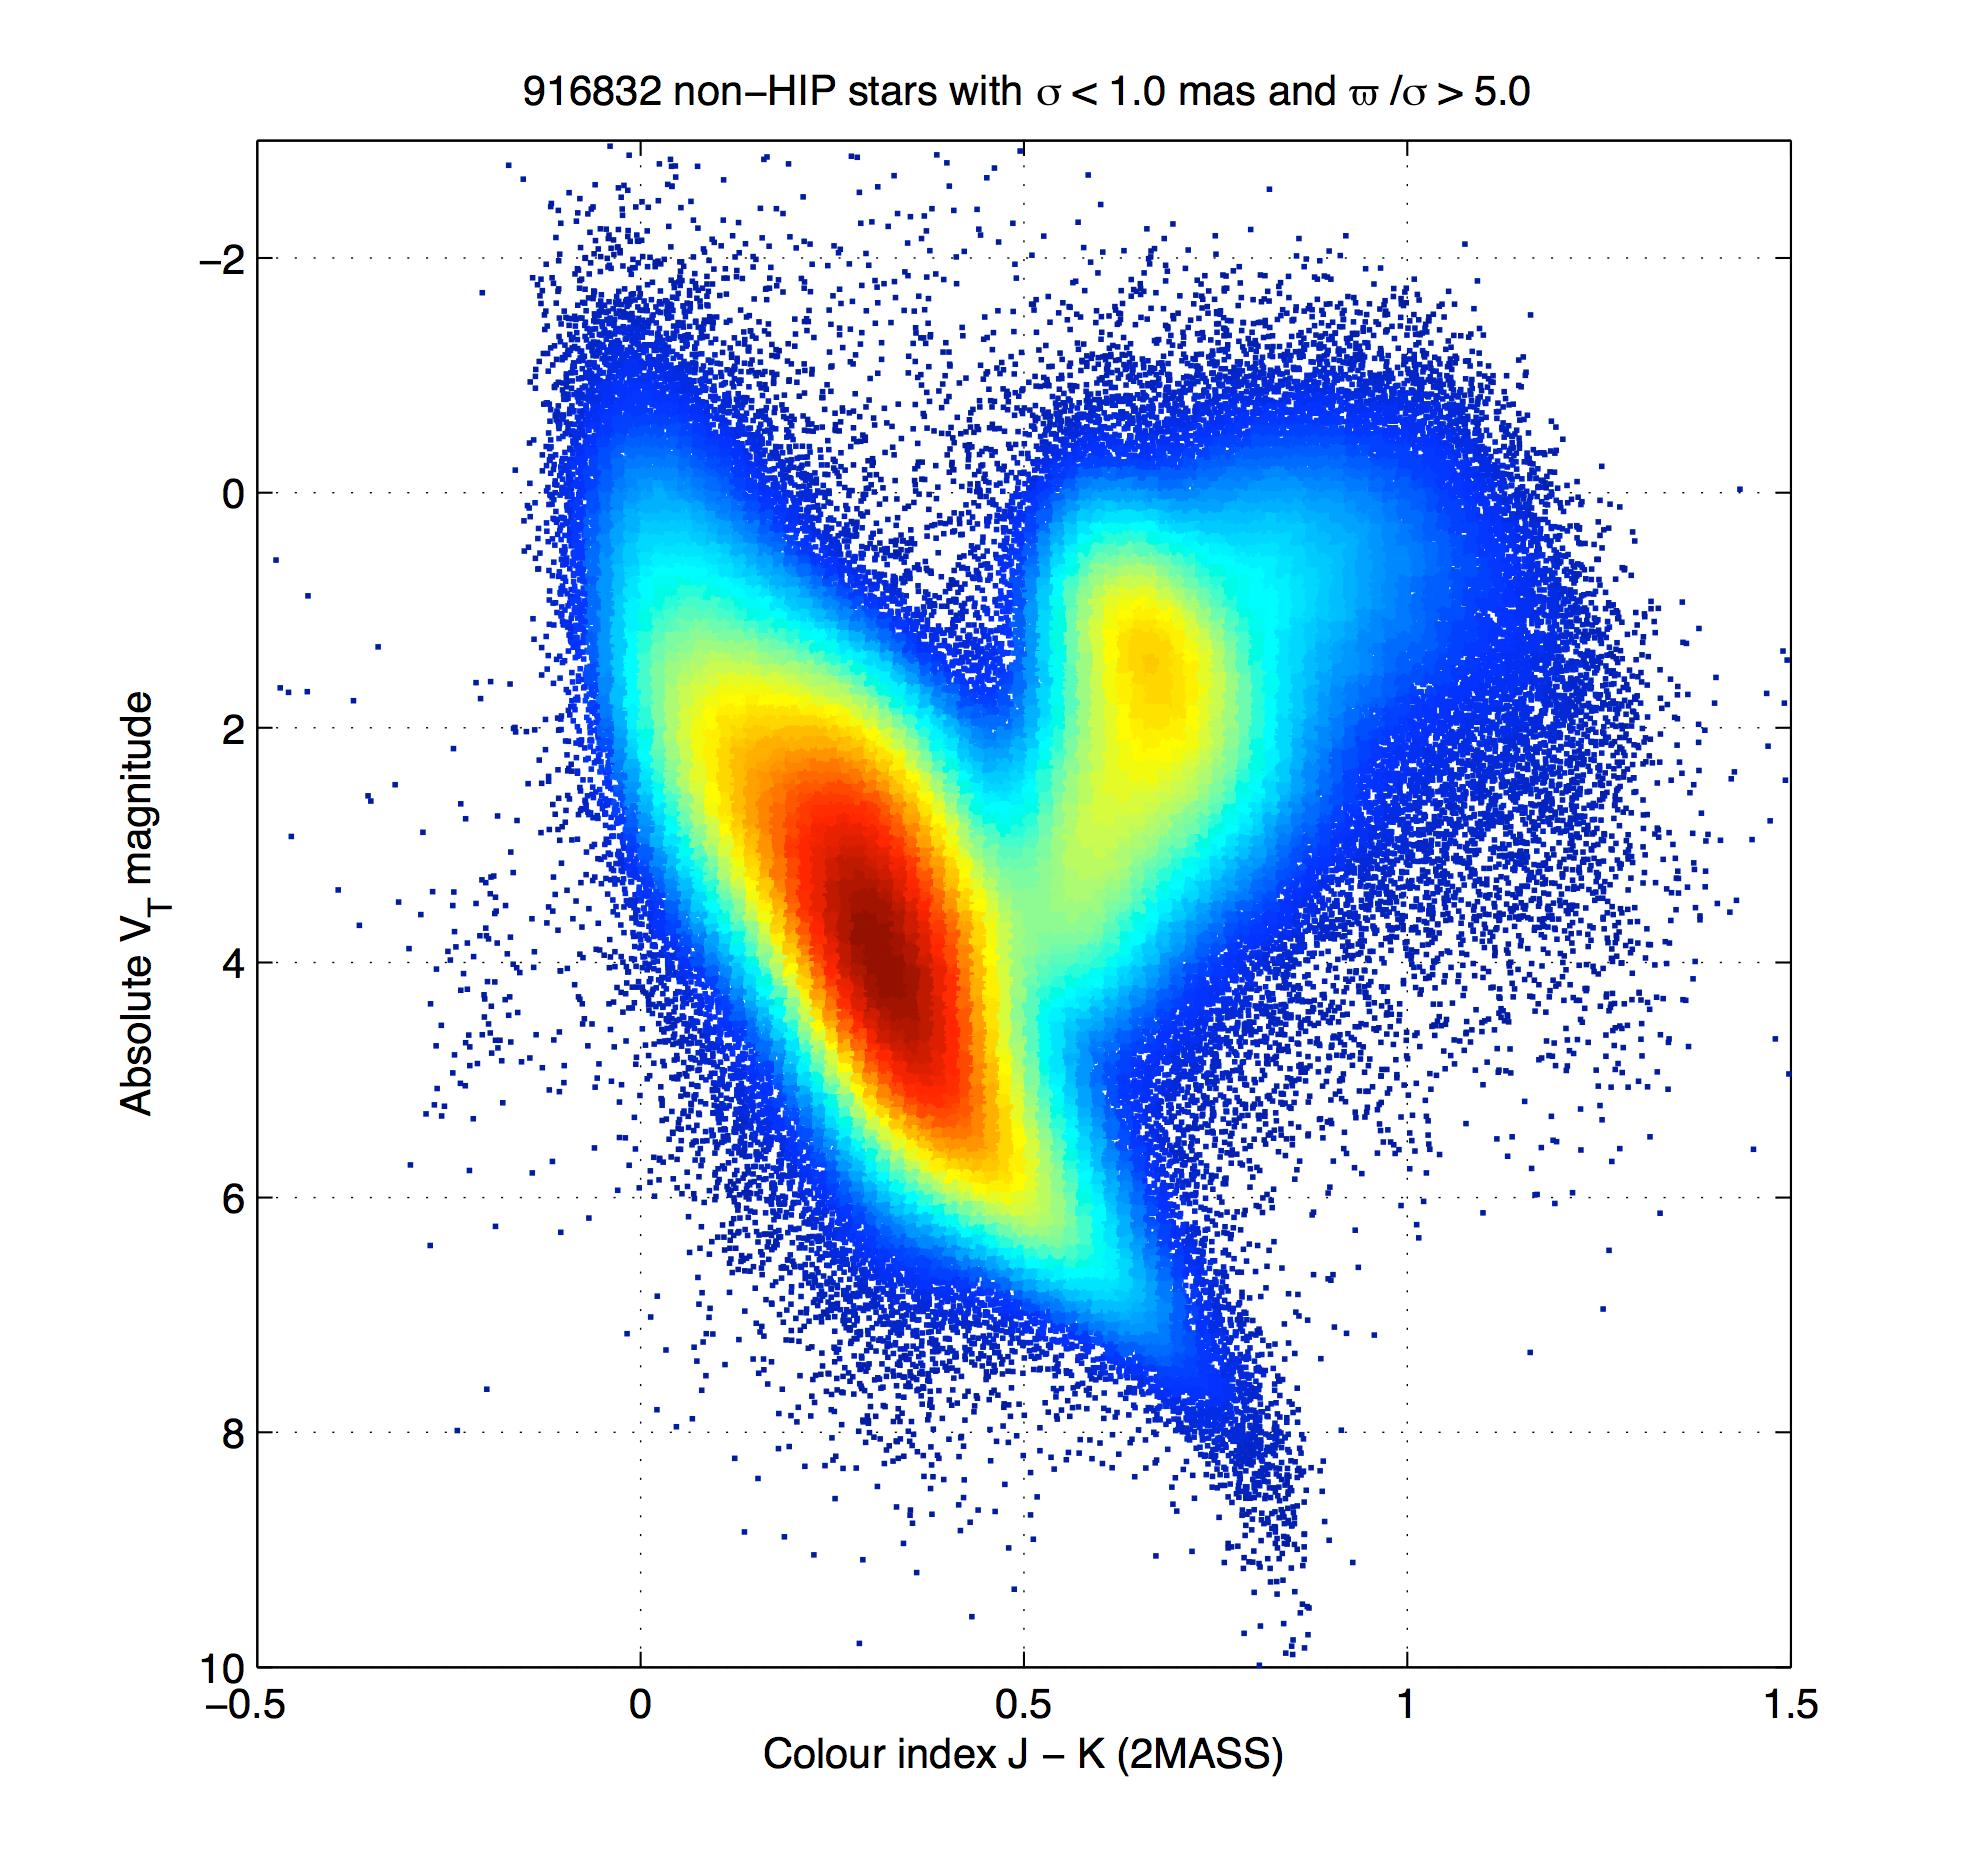 News20150807 cosmos demonstrating gaias astrometric potential pooptronica Choice Image